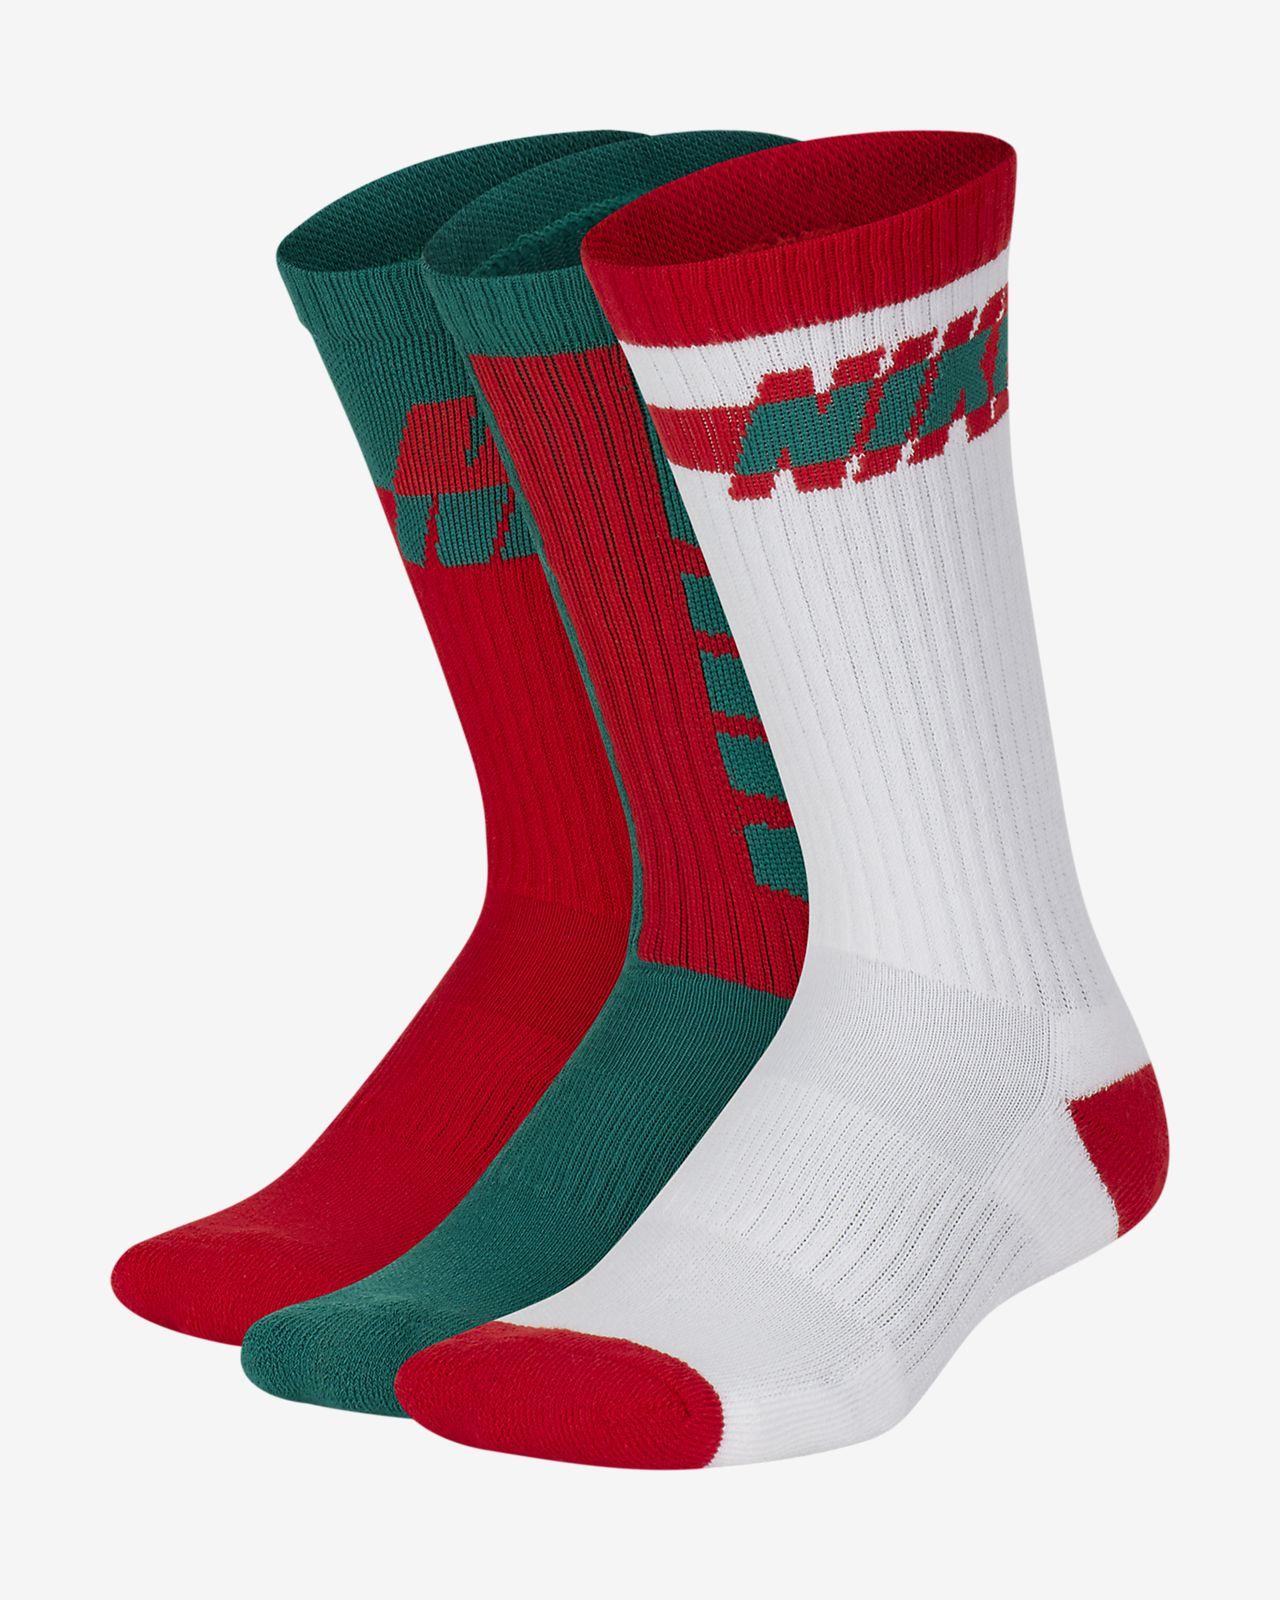 Nike Everyday Lightweight Kids' Crew Socks (3 Pairs)